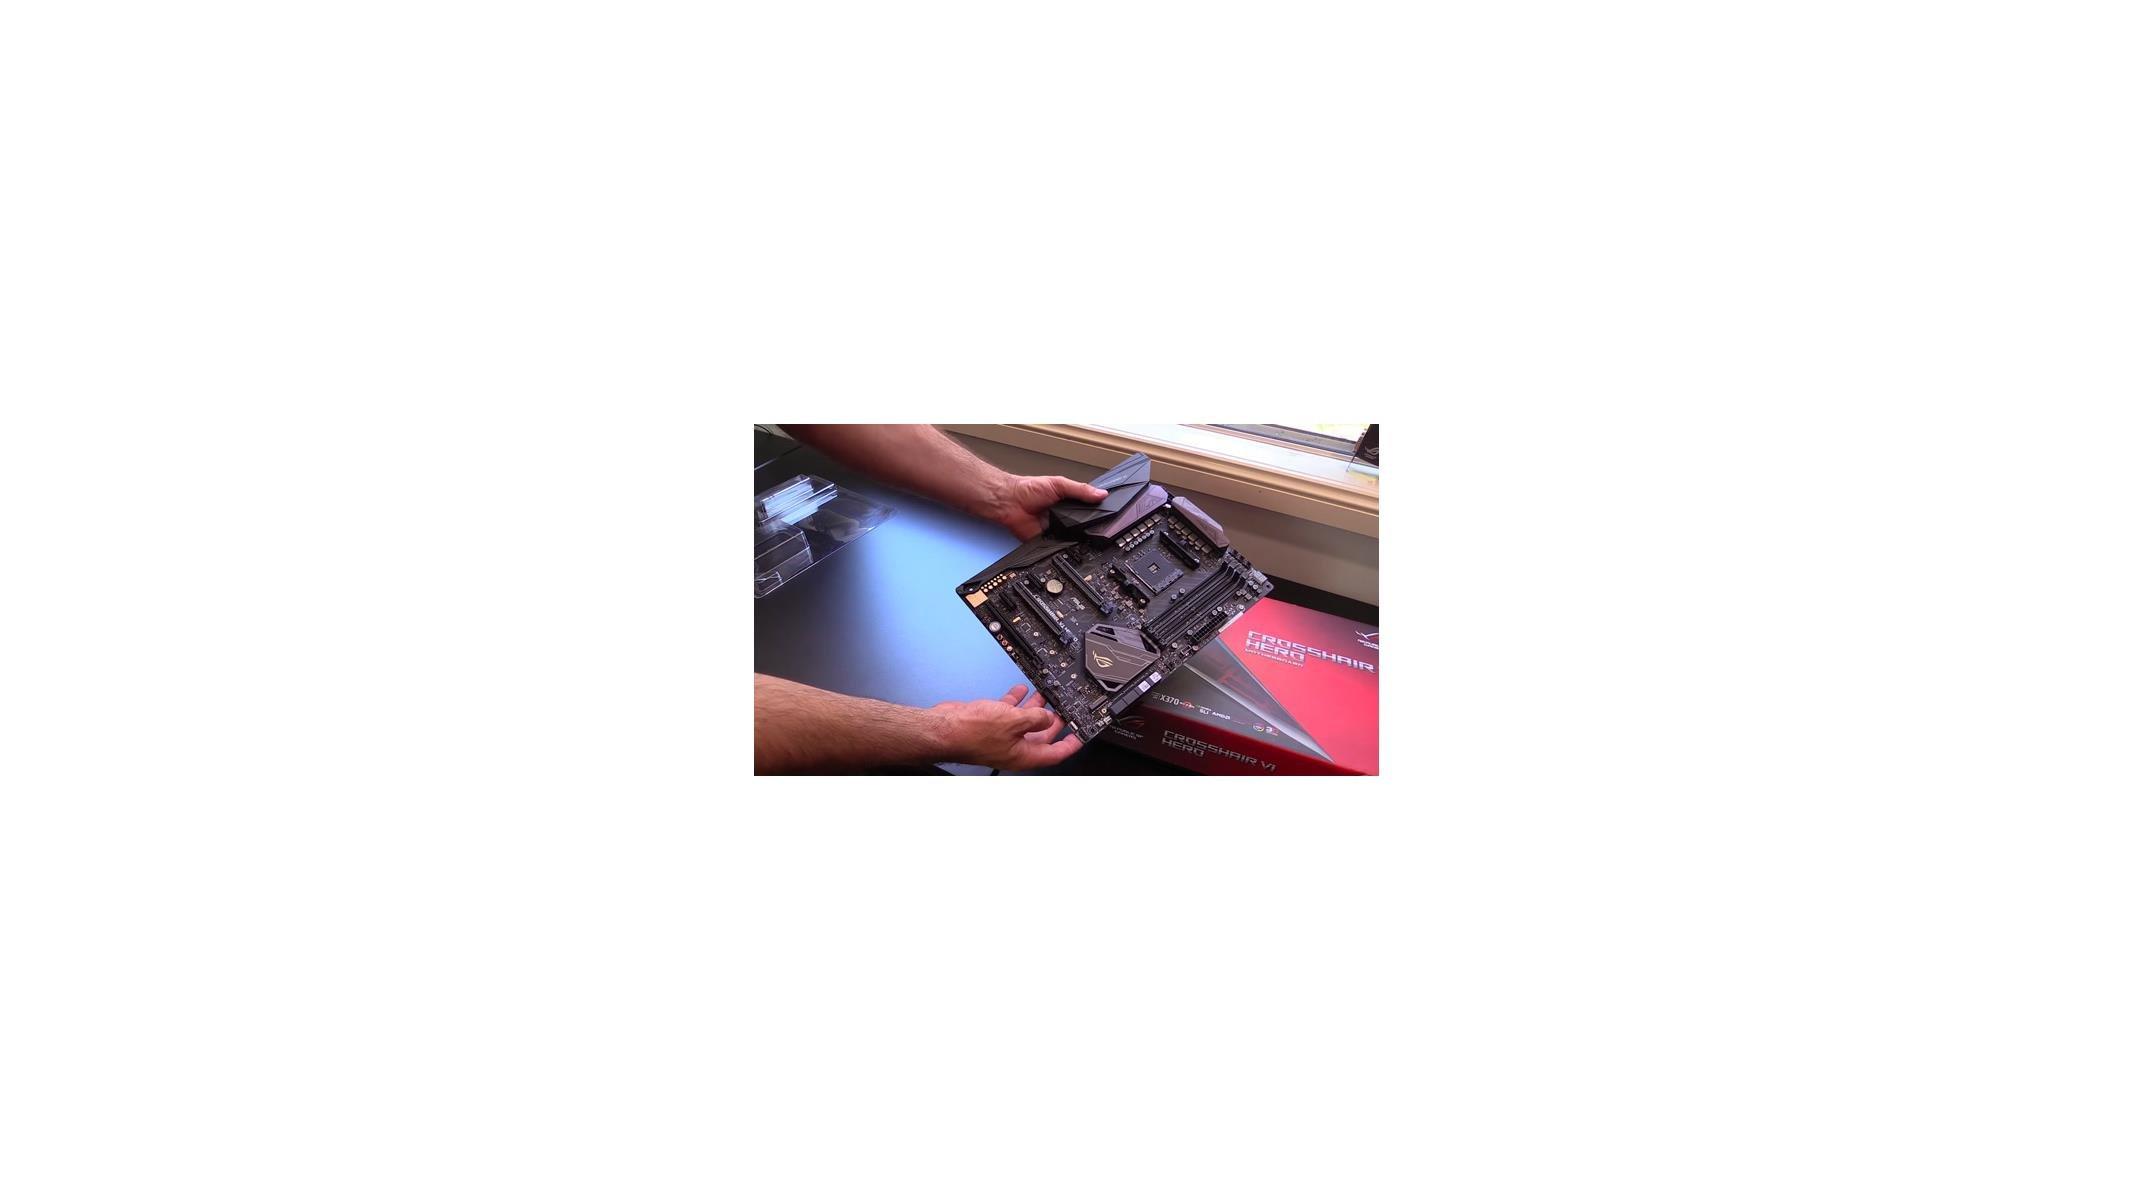 ASUS ROG Crosshair VI Hero AMD AM4 X370 Ryzen Motherboard